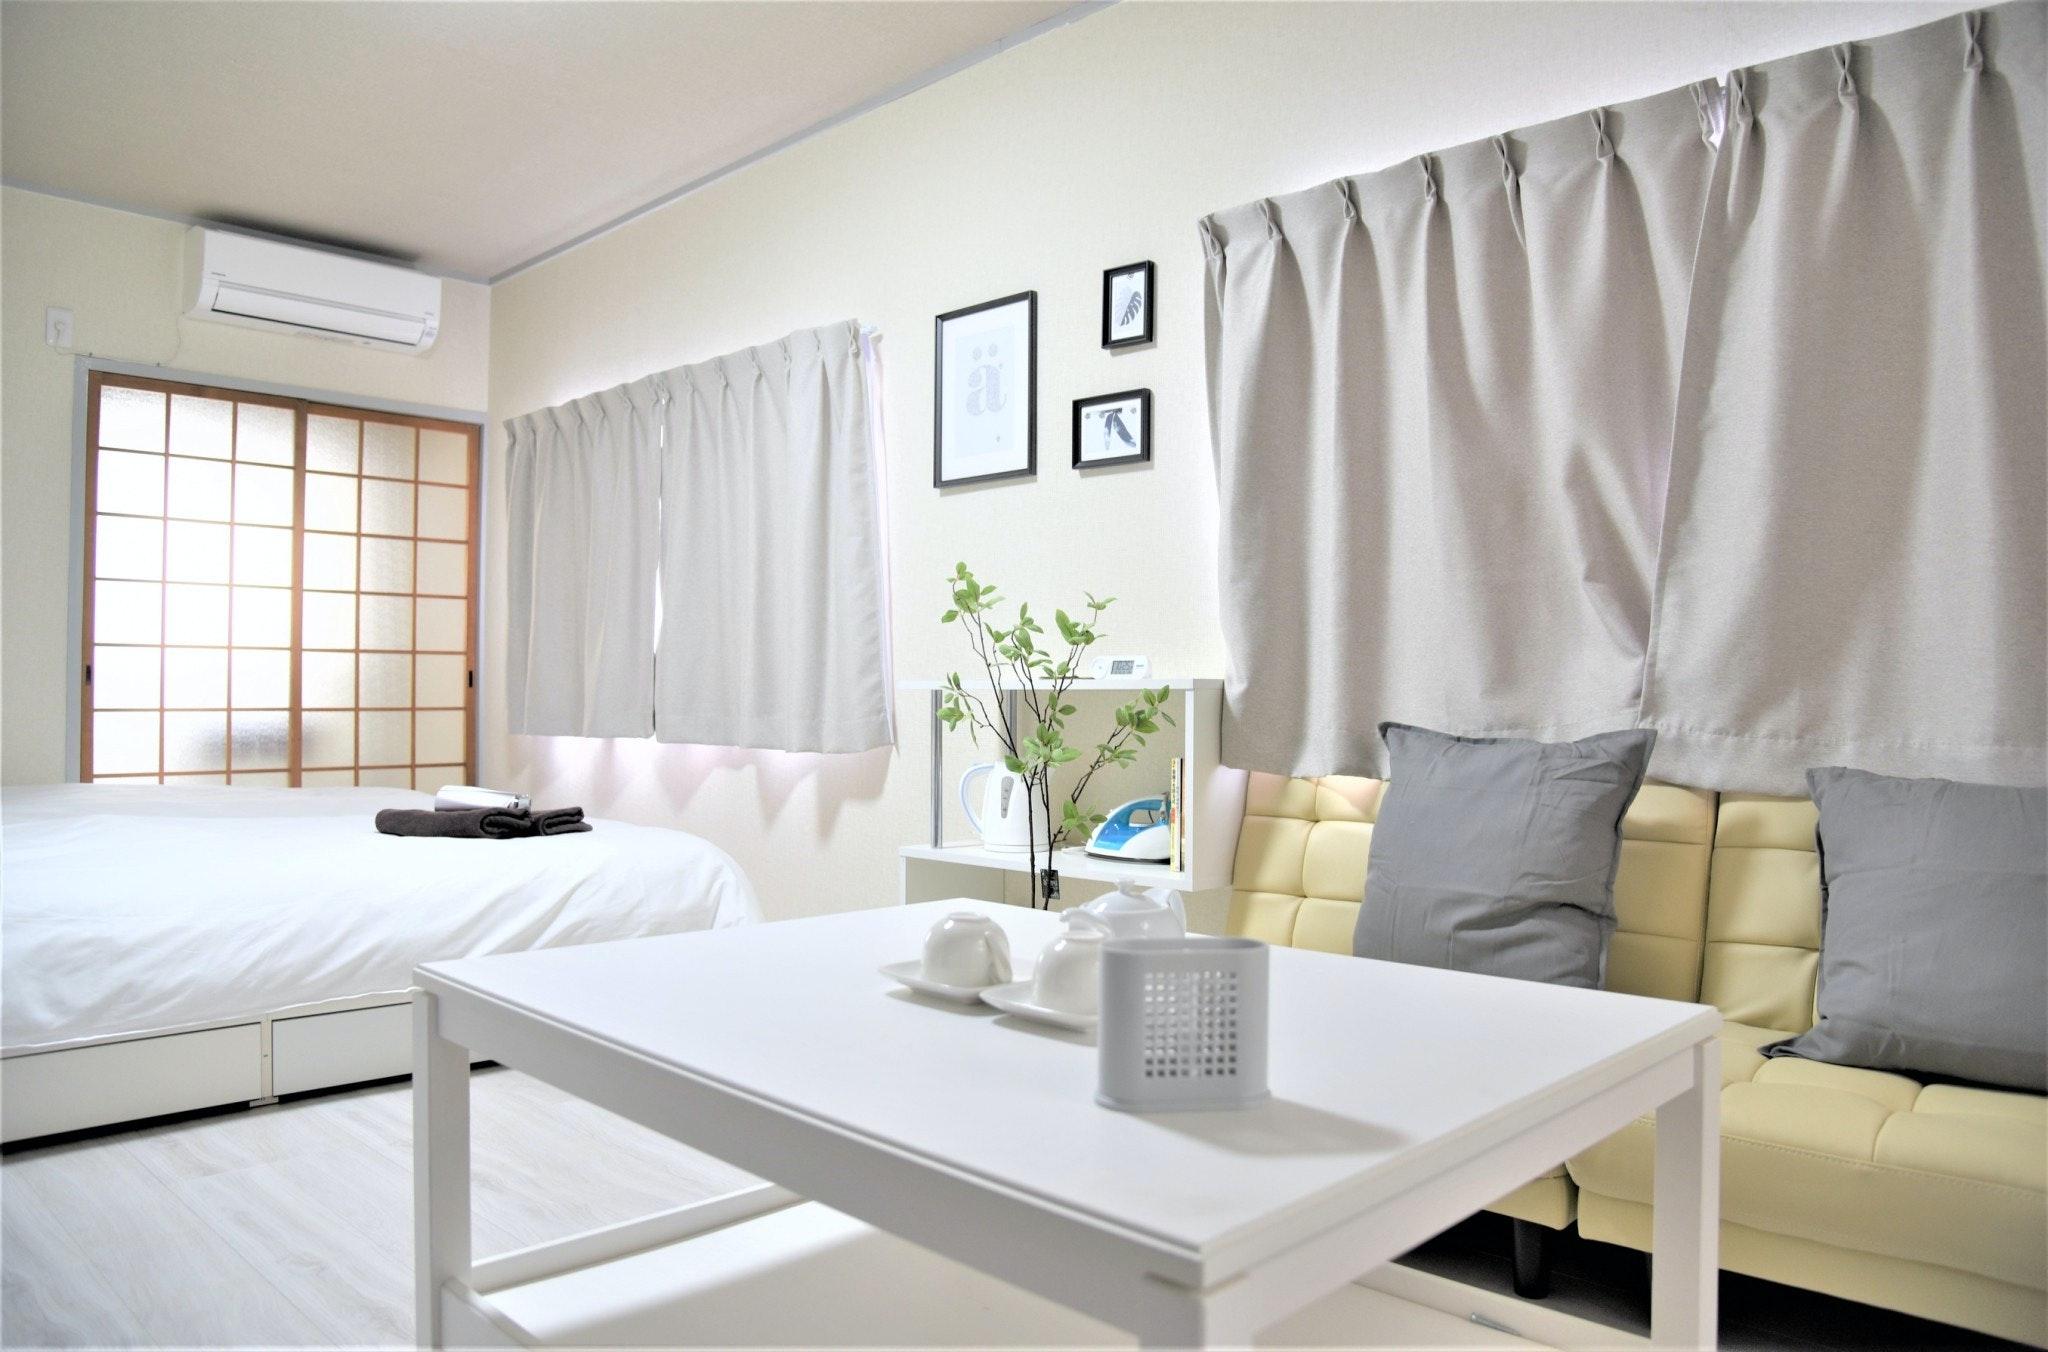 [AR5] 昔ながらの大阪の魅力な街にグランドオープン 観光地へのアクセス絶好 WIFI完備